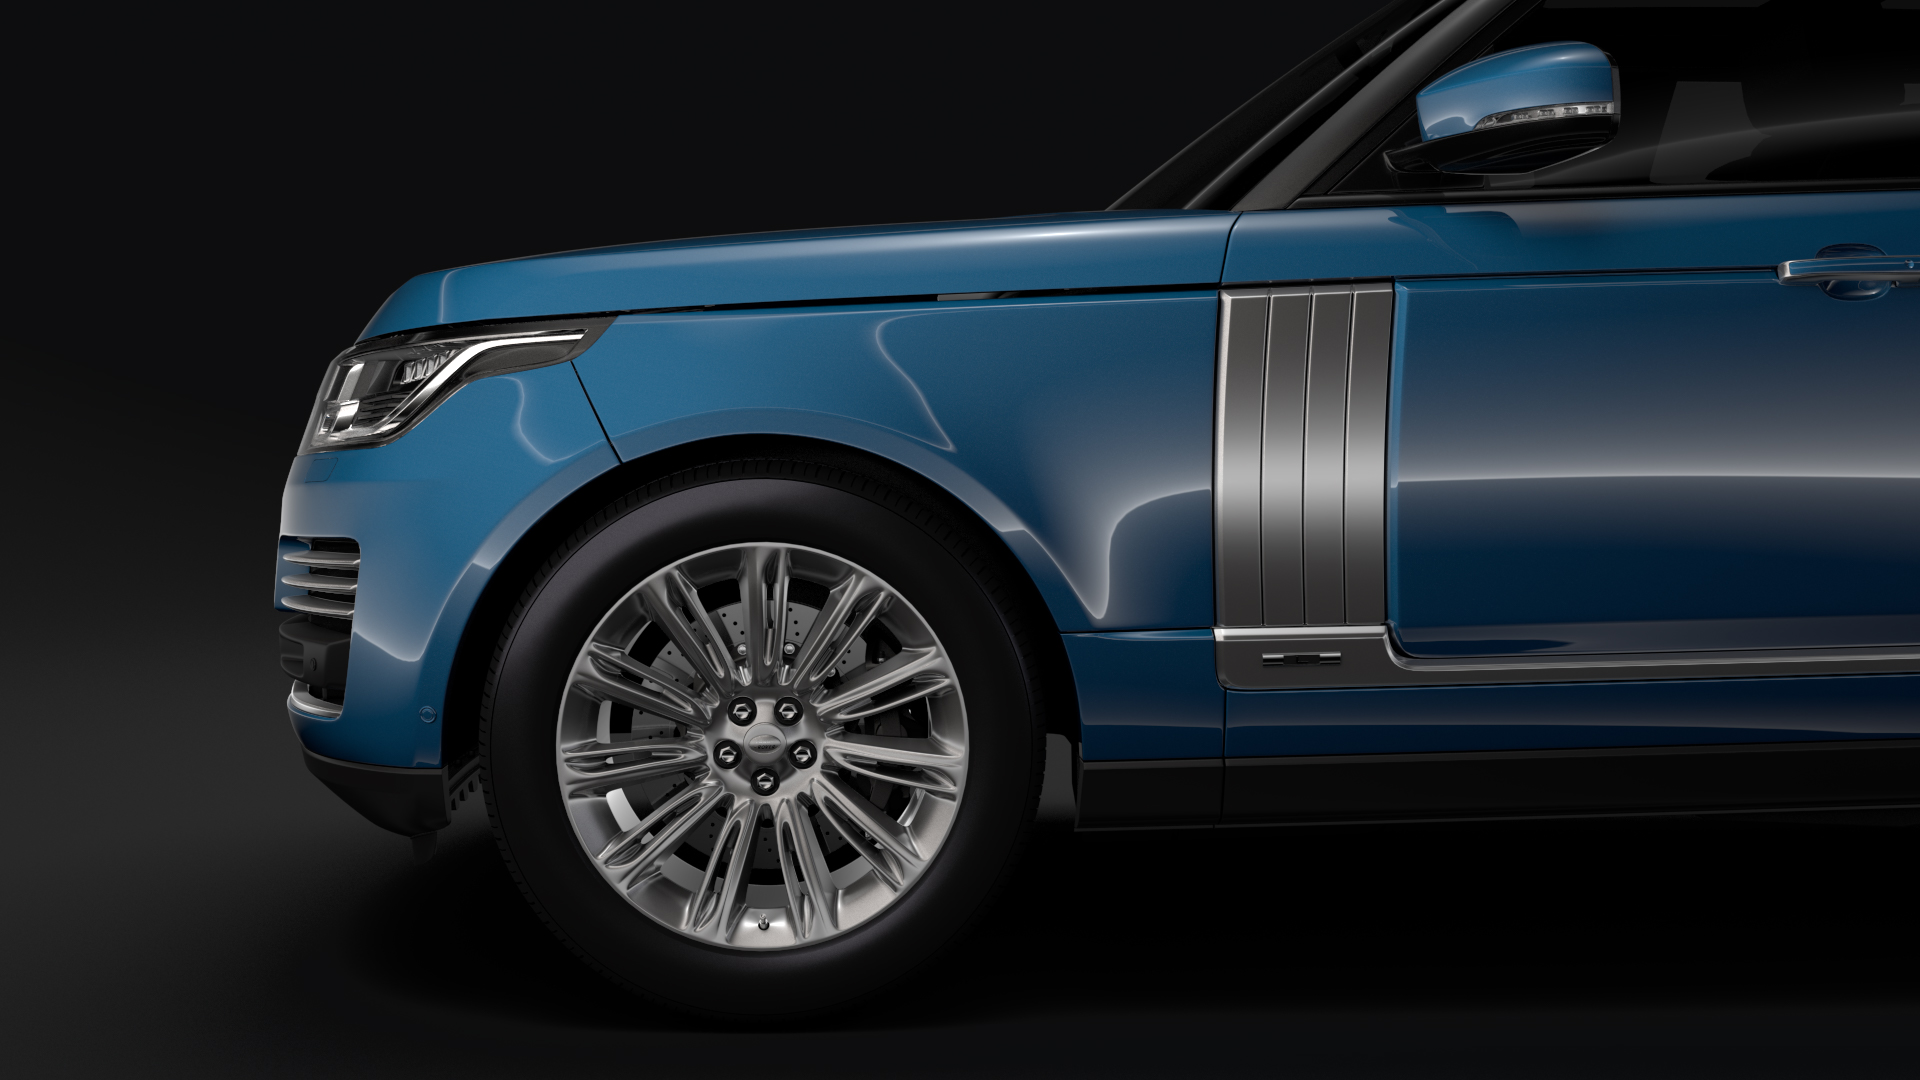 range rover autobiography lwb l405 2018 3d model max fbx c4d lwo ma mb hrc xsi obj 277332